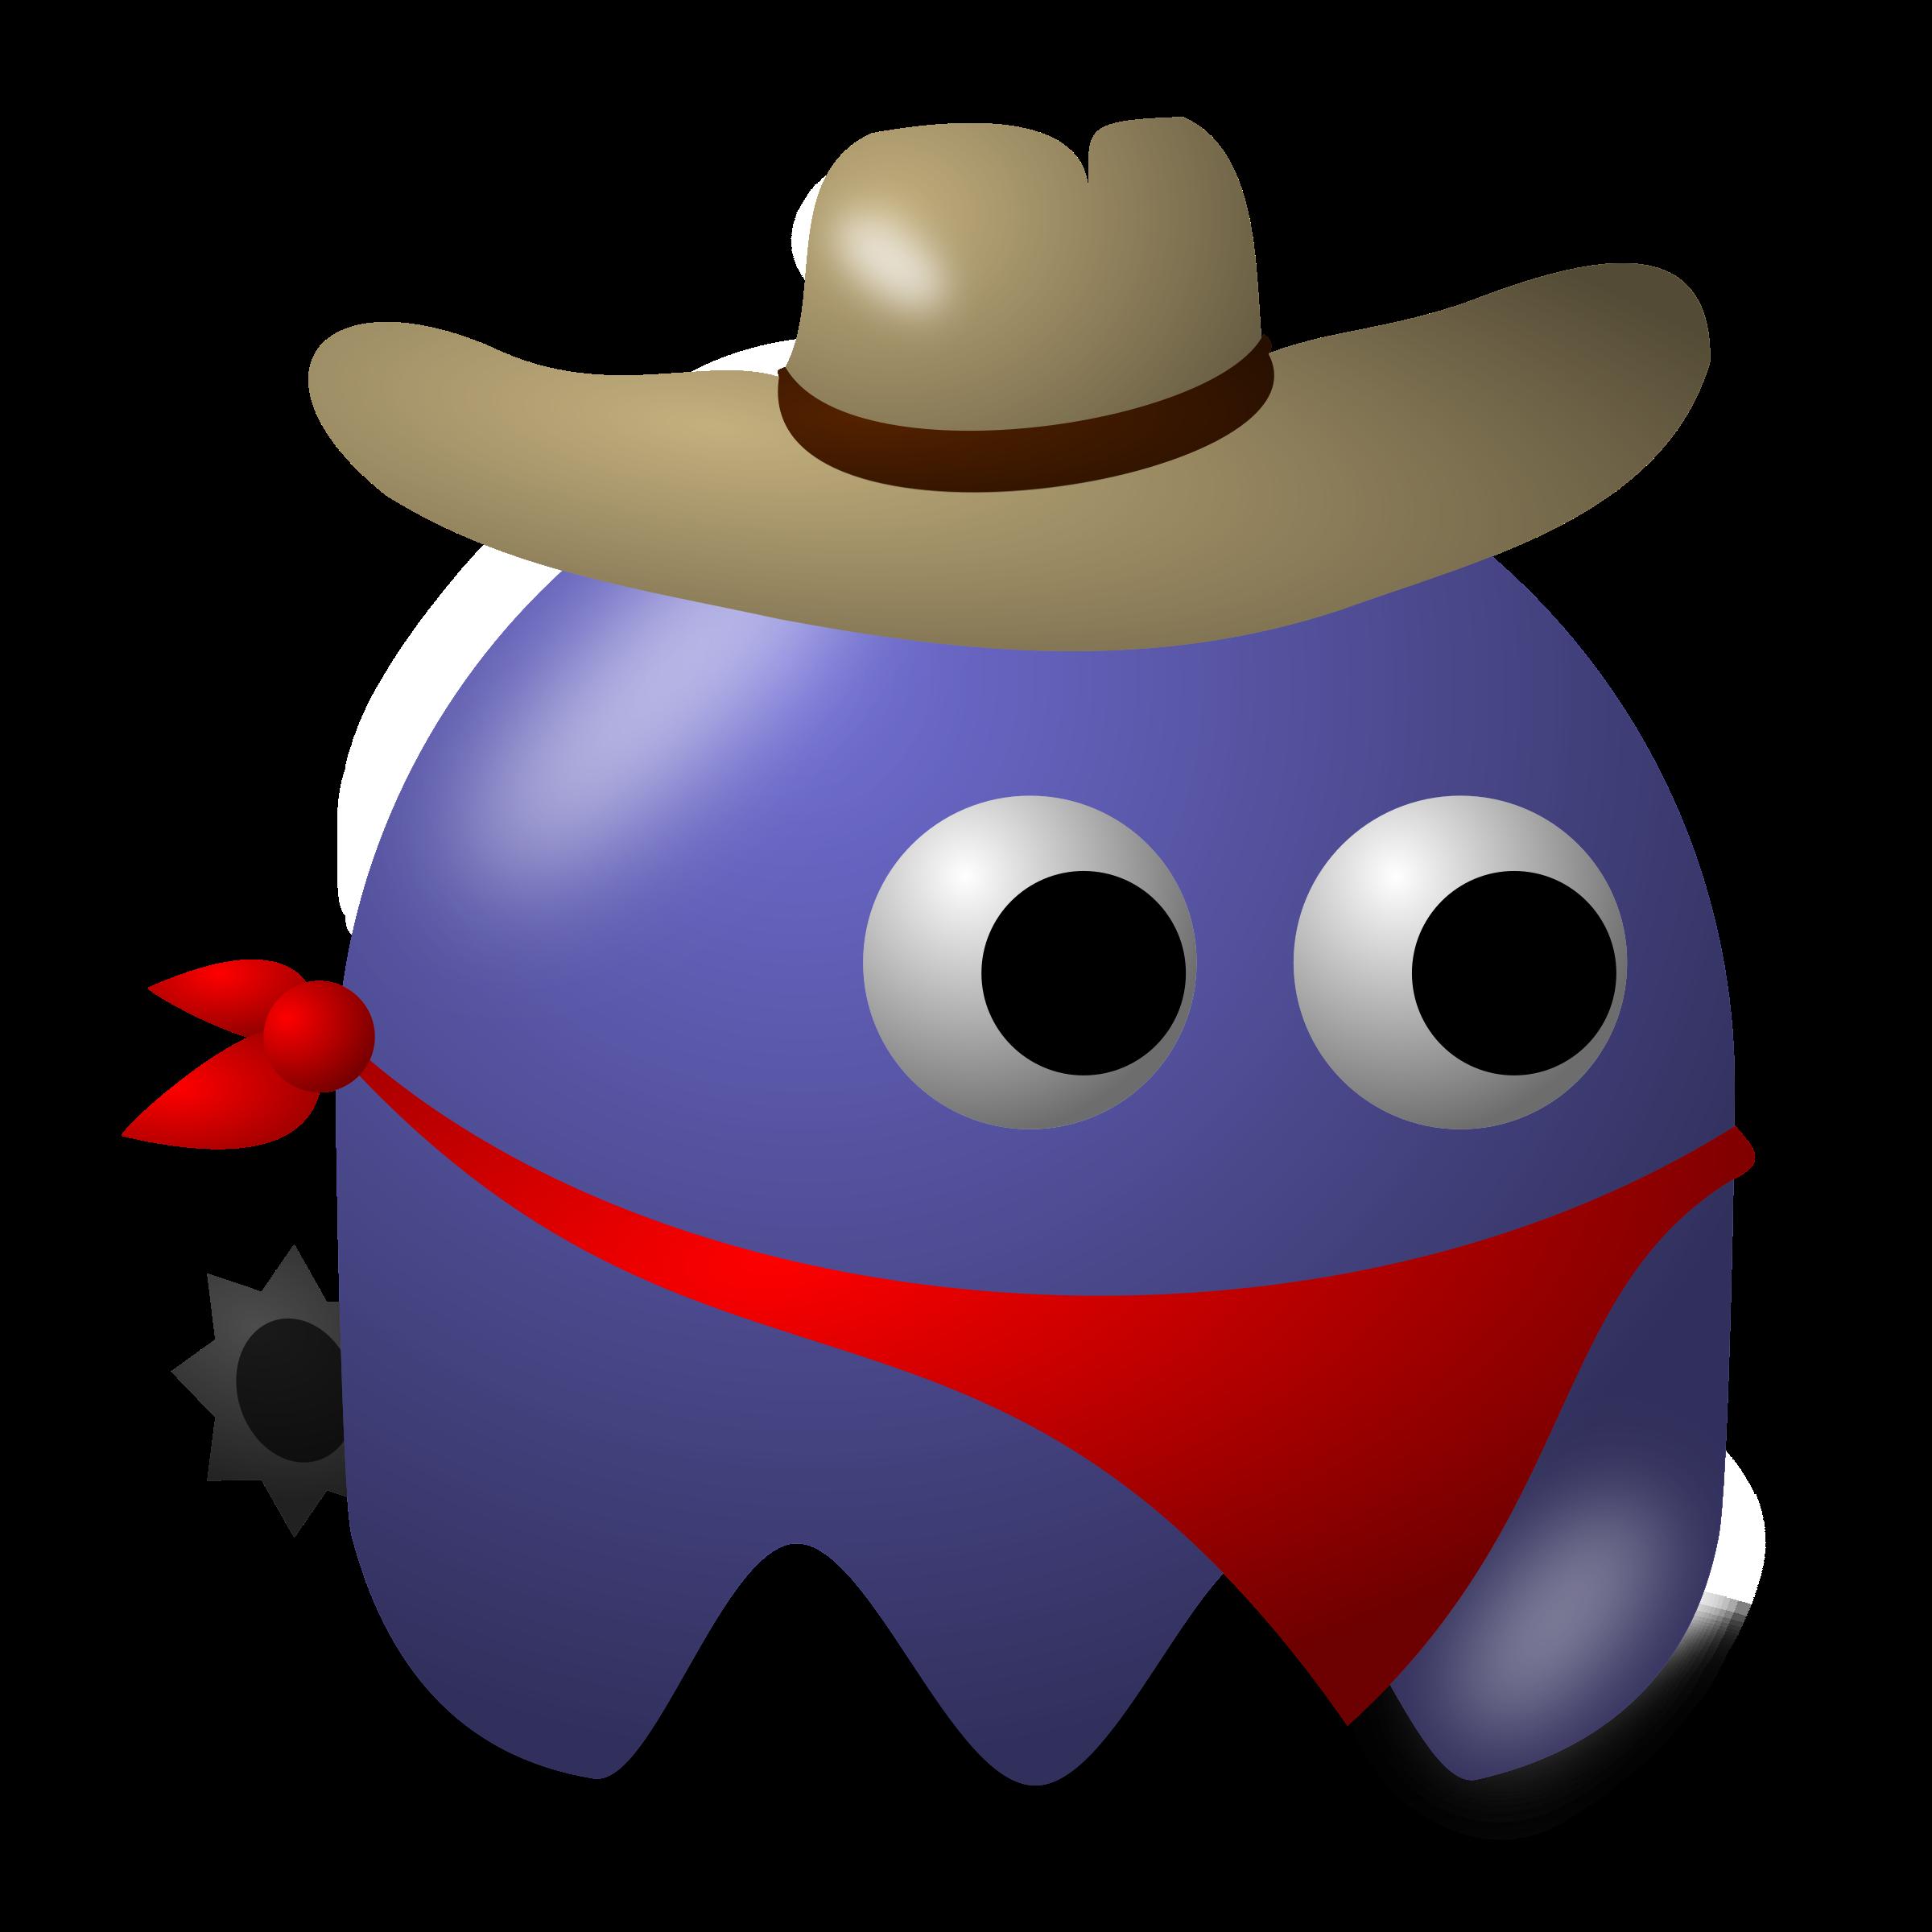 Baddie cowboy big image. Costume clipart game